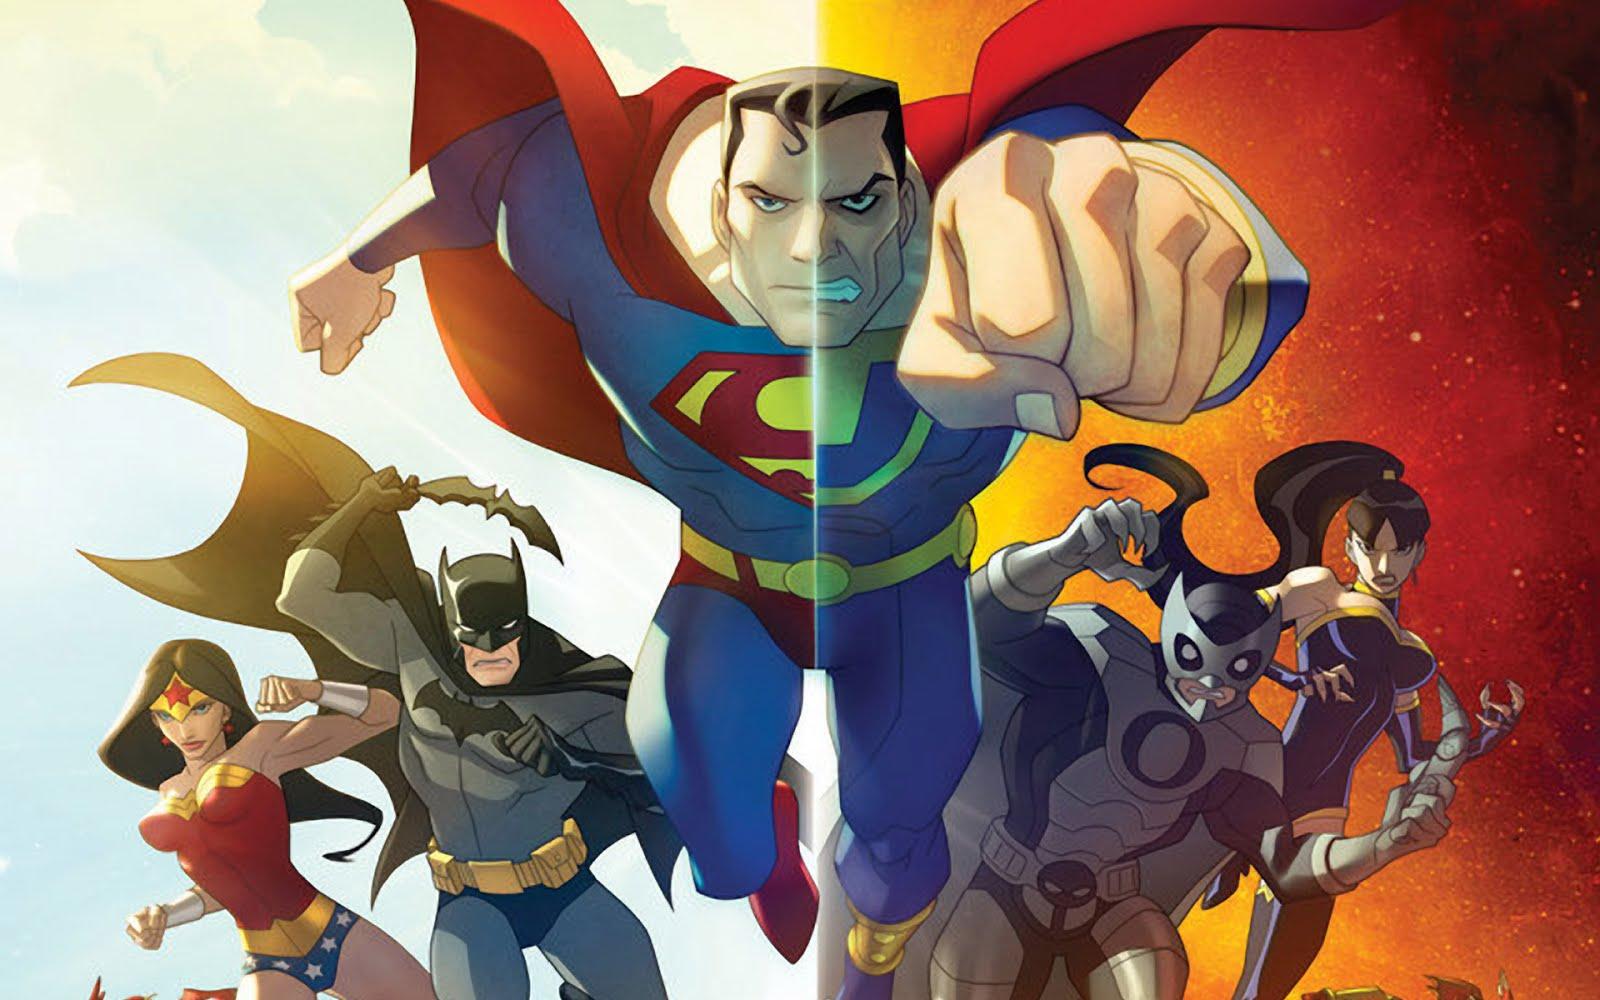 Cartoon Heroes Wallpaper - Cartoon Images